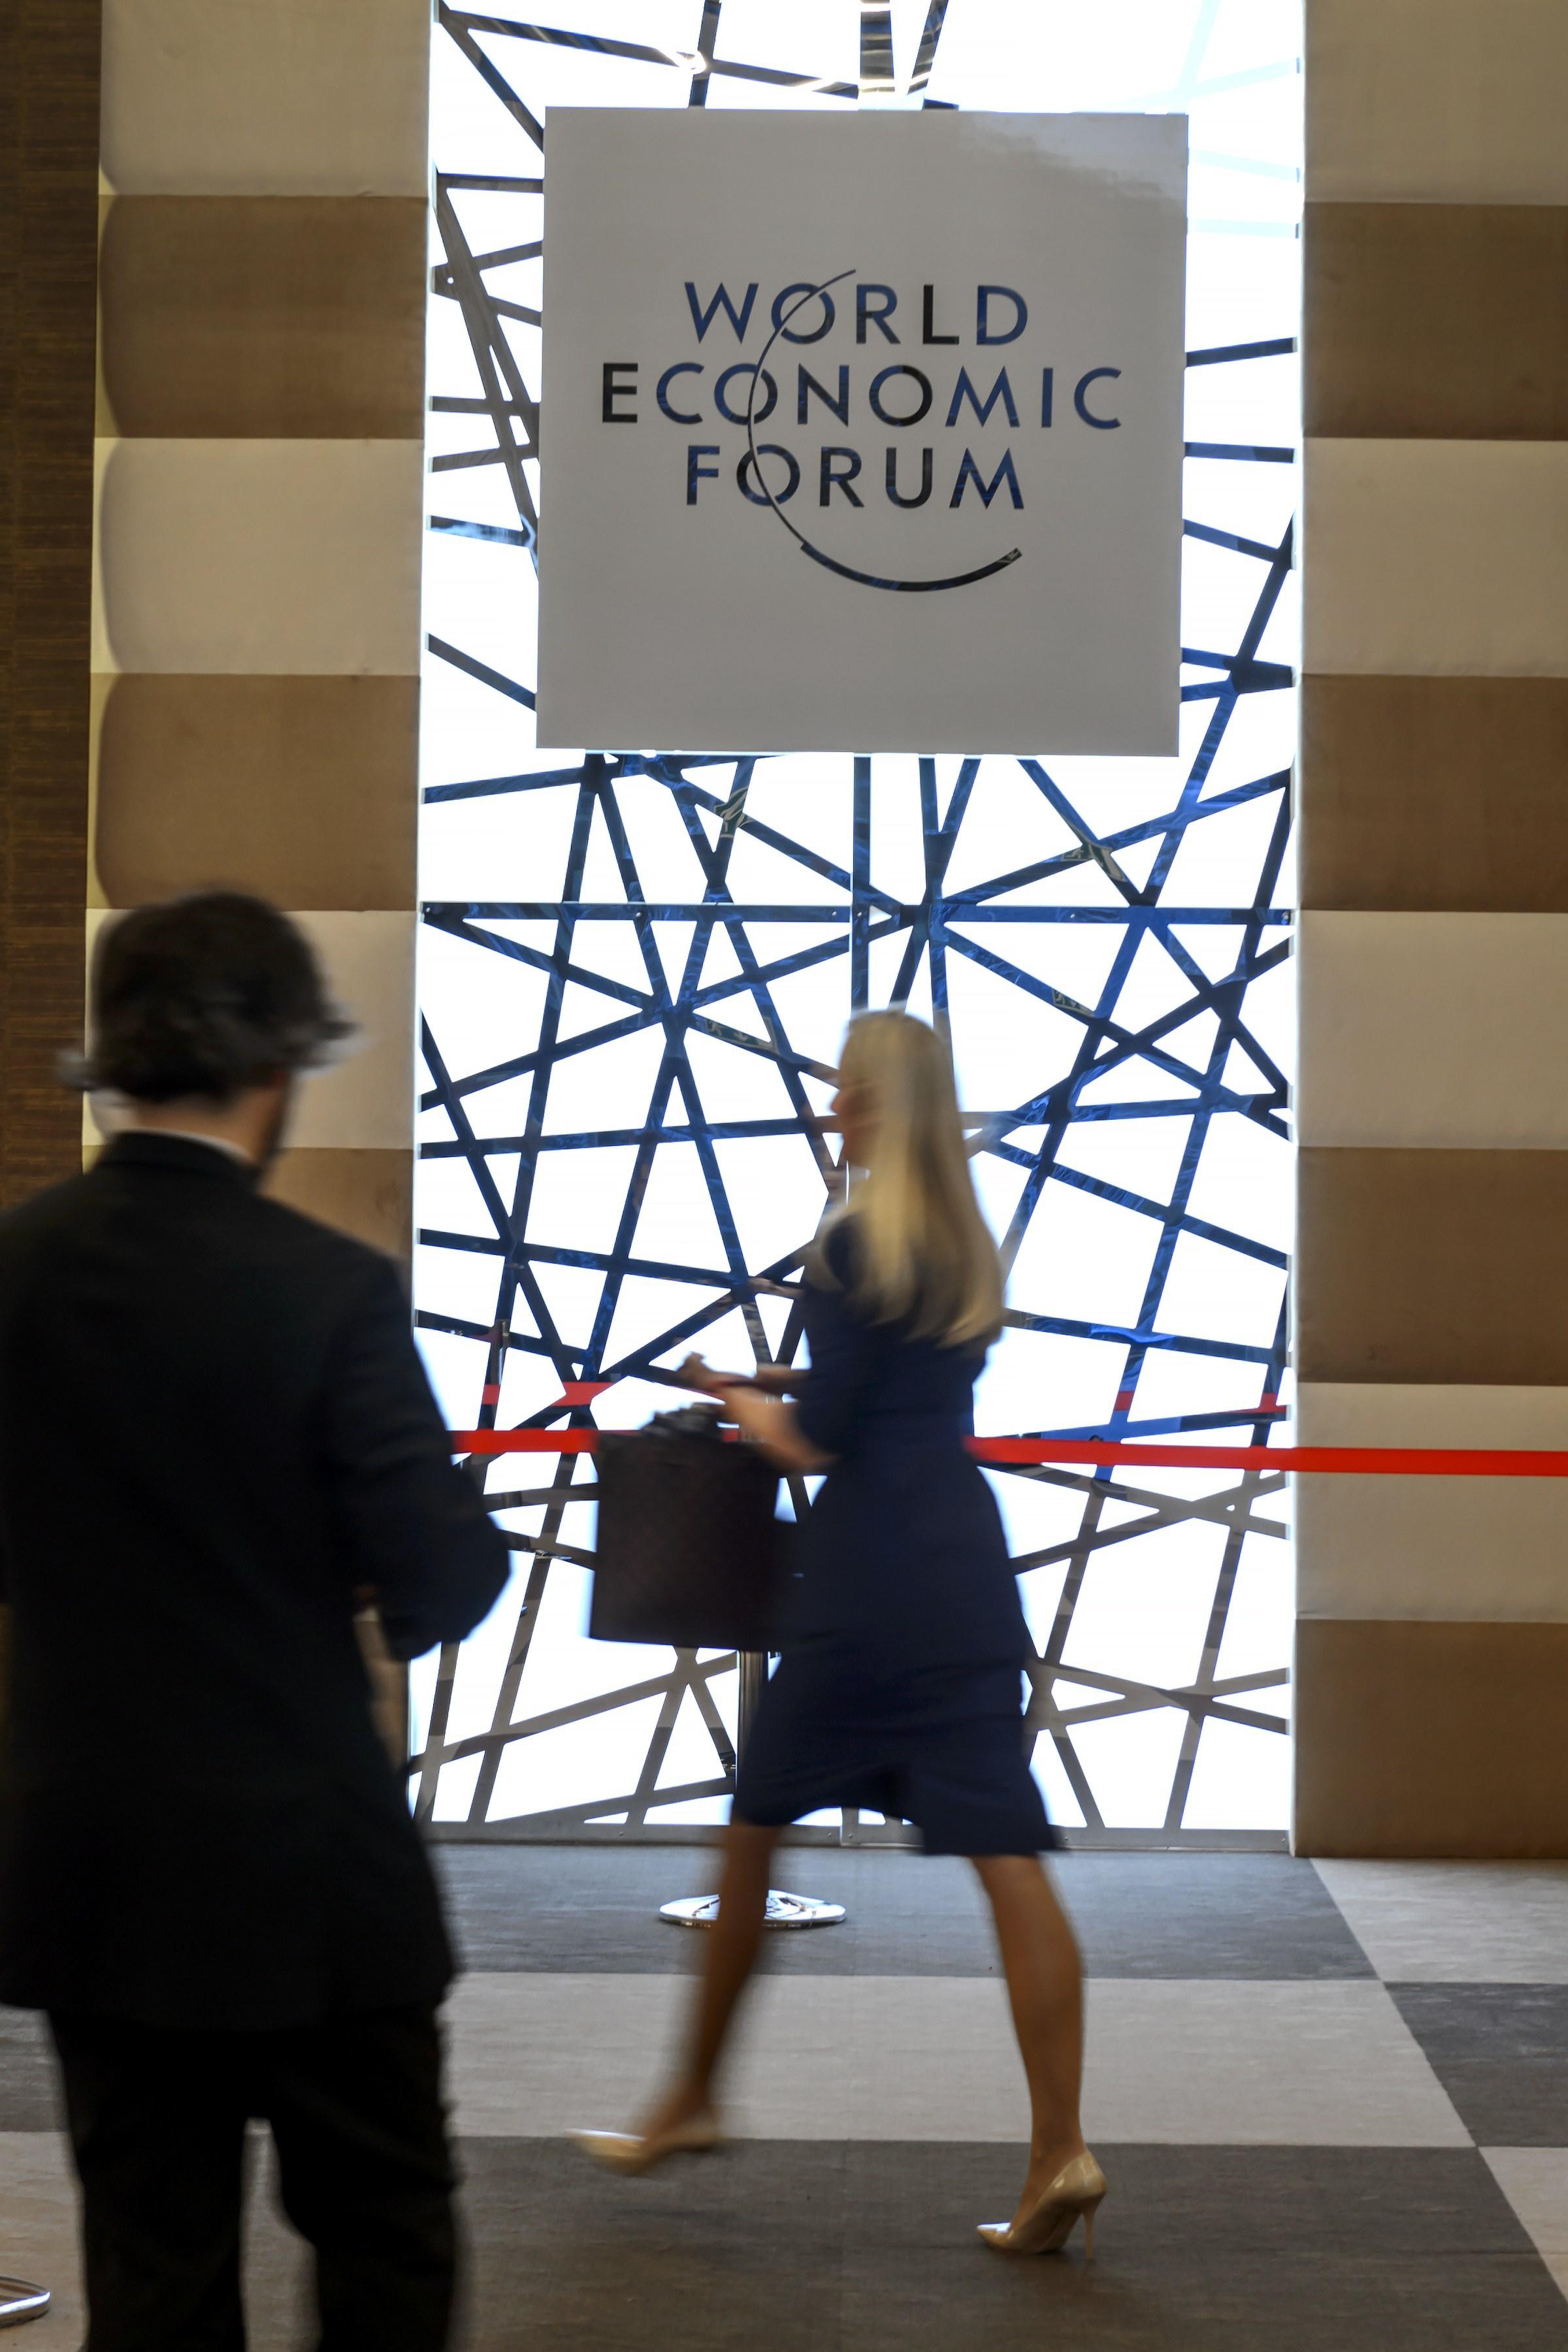 People enter the World Economic Forum (WEF) in Davos, Switzerland on Jan. 20, 2015.